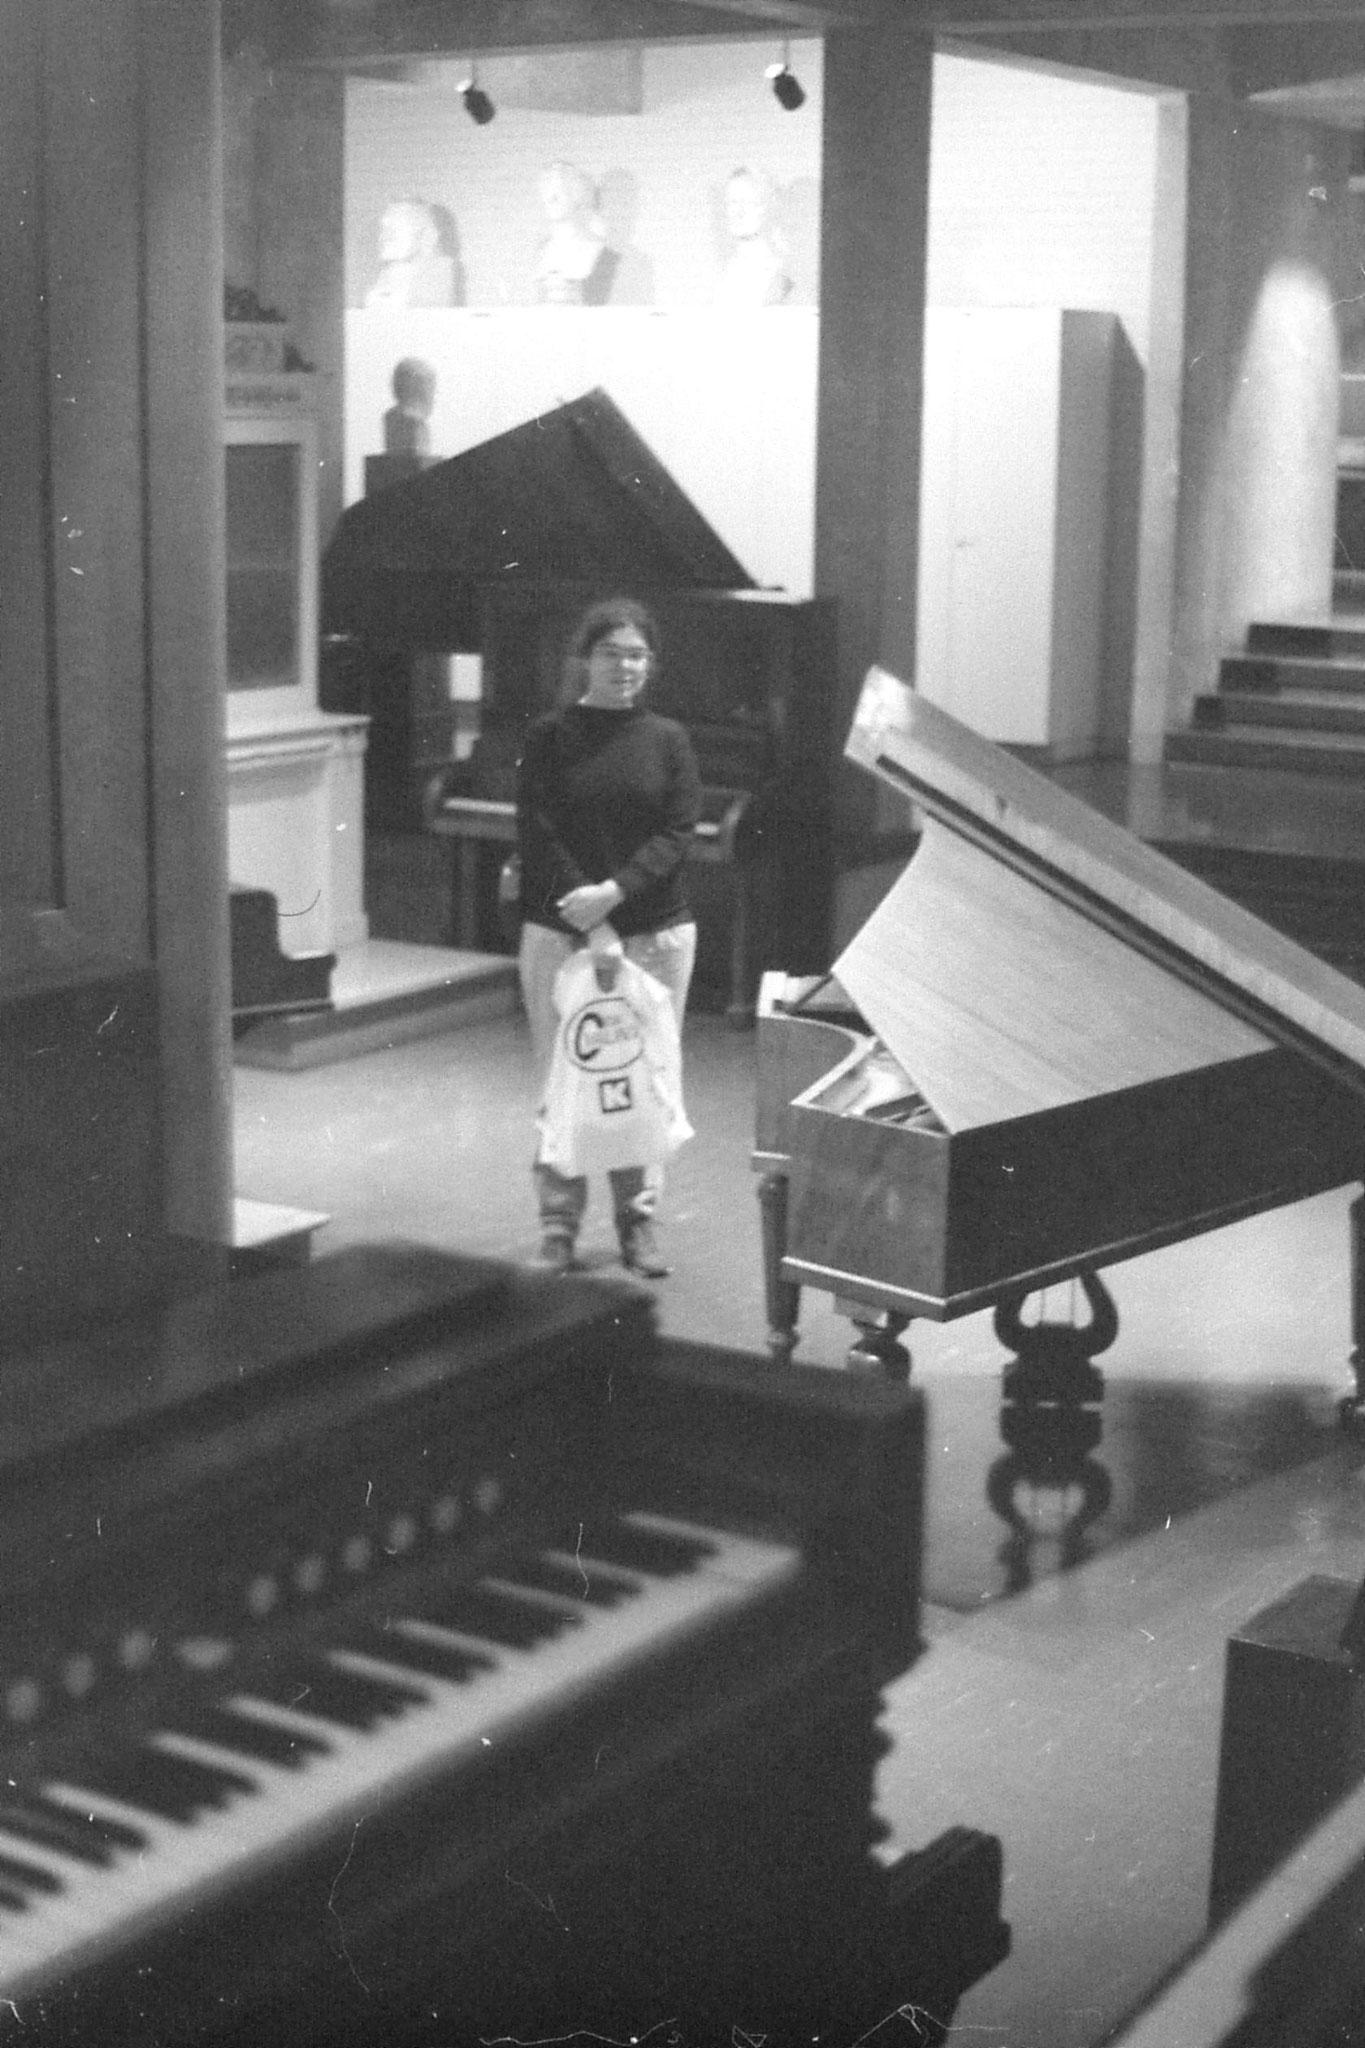 7/10/1988: 30: Sibelius museum, Turku